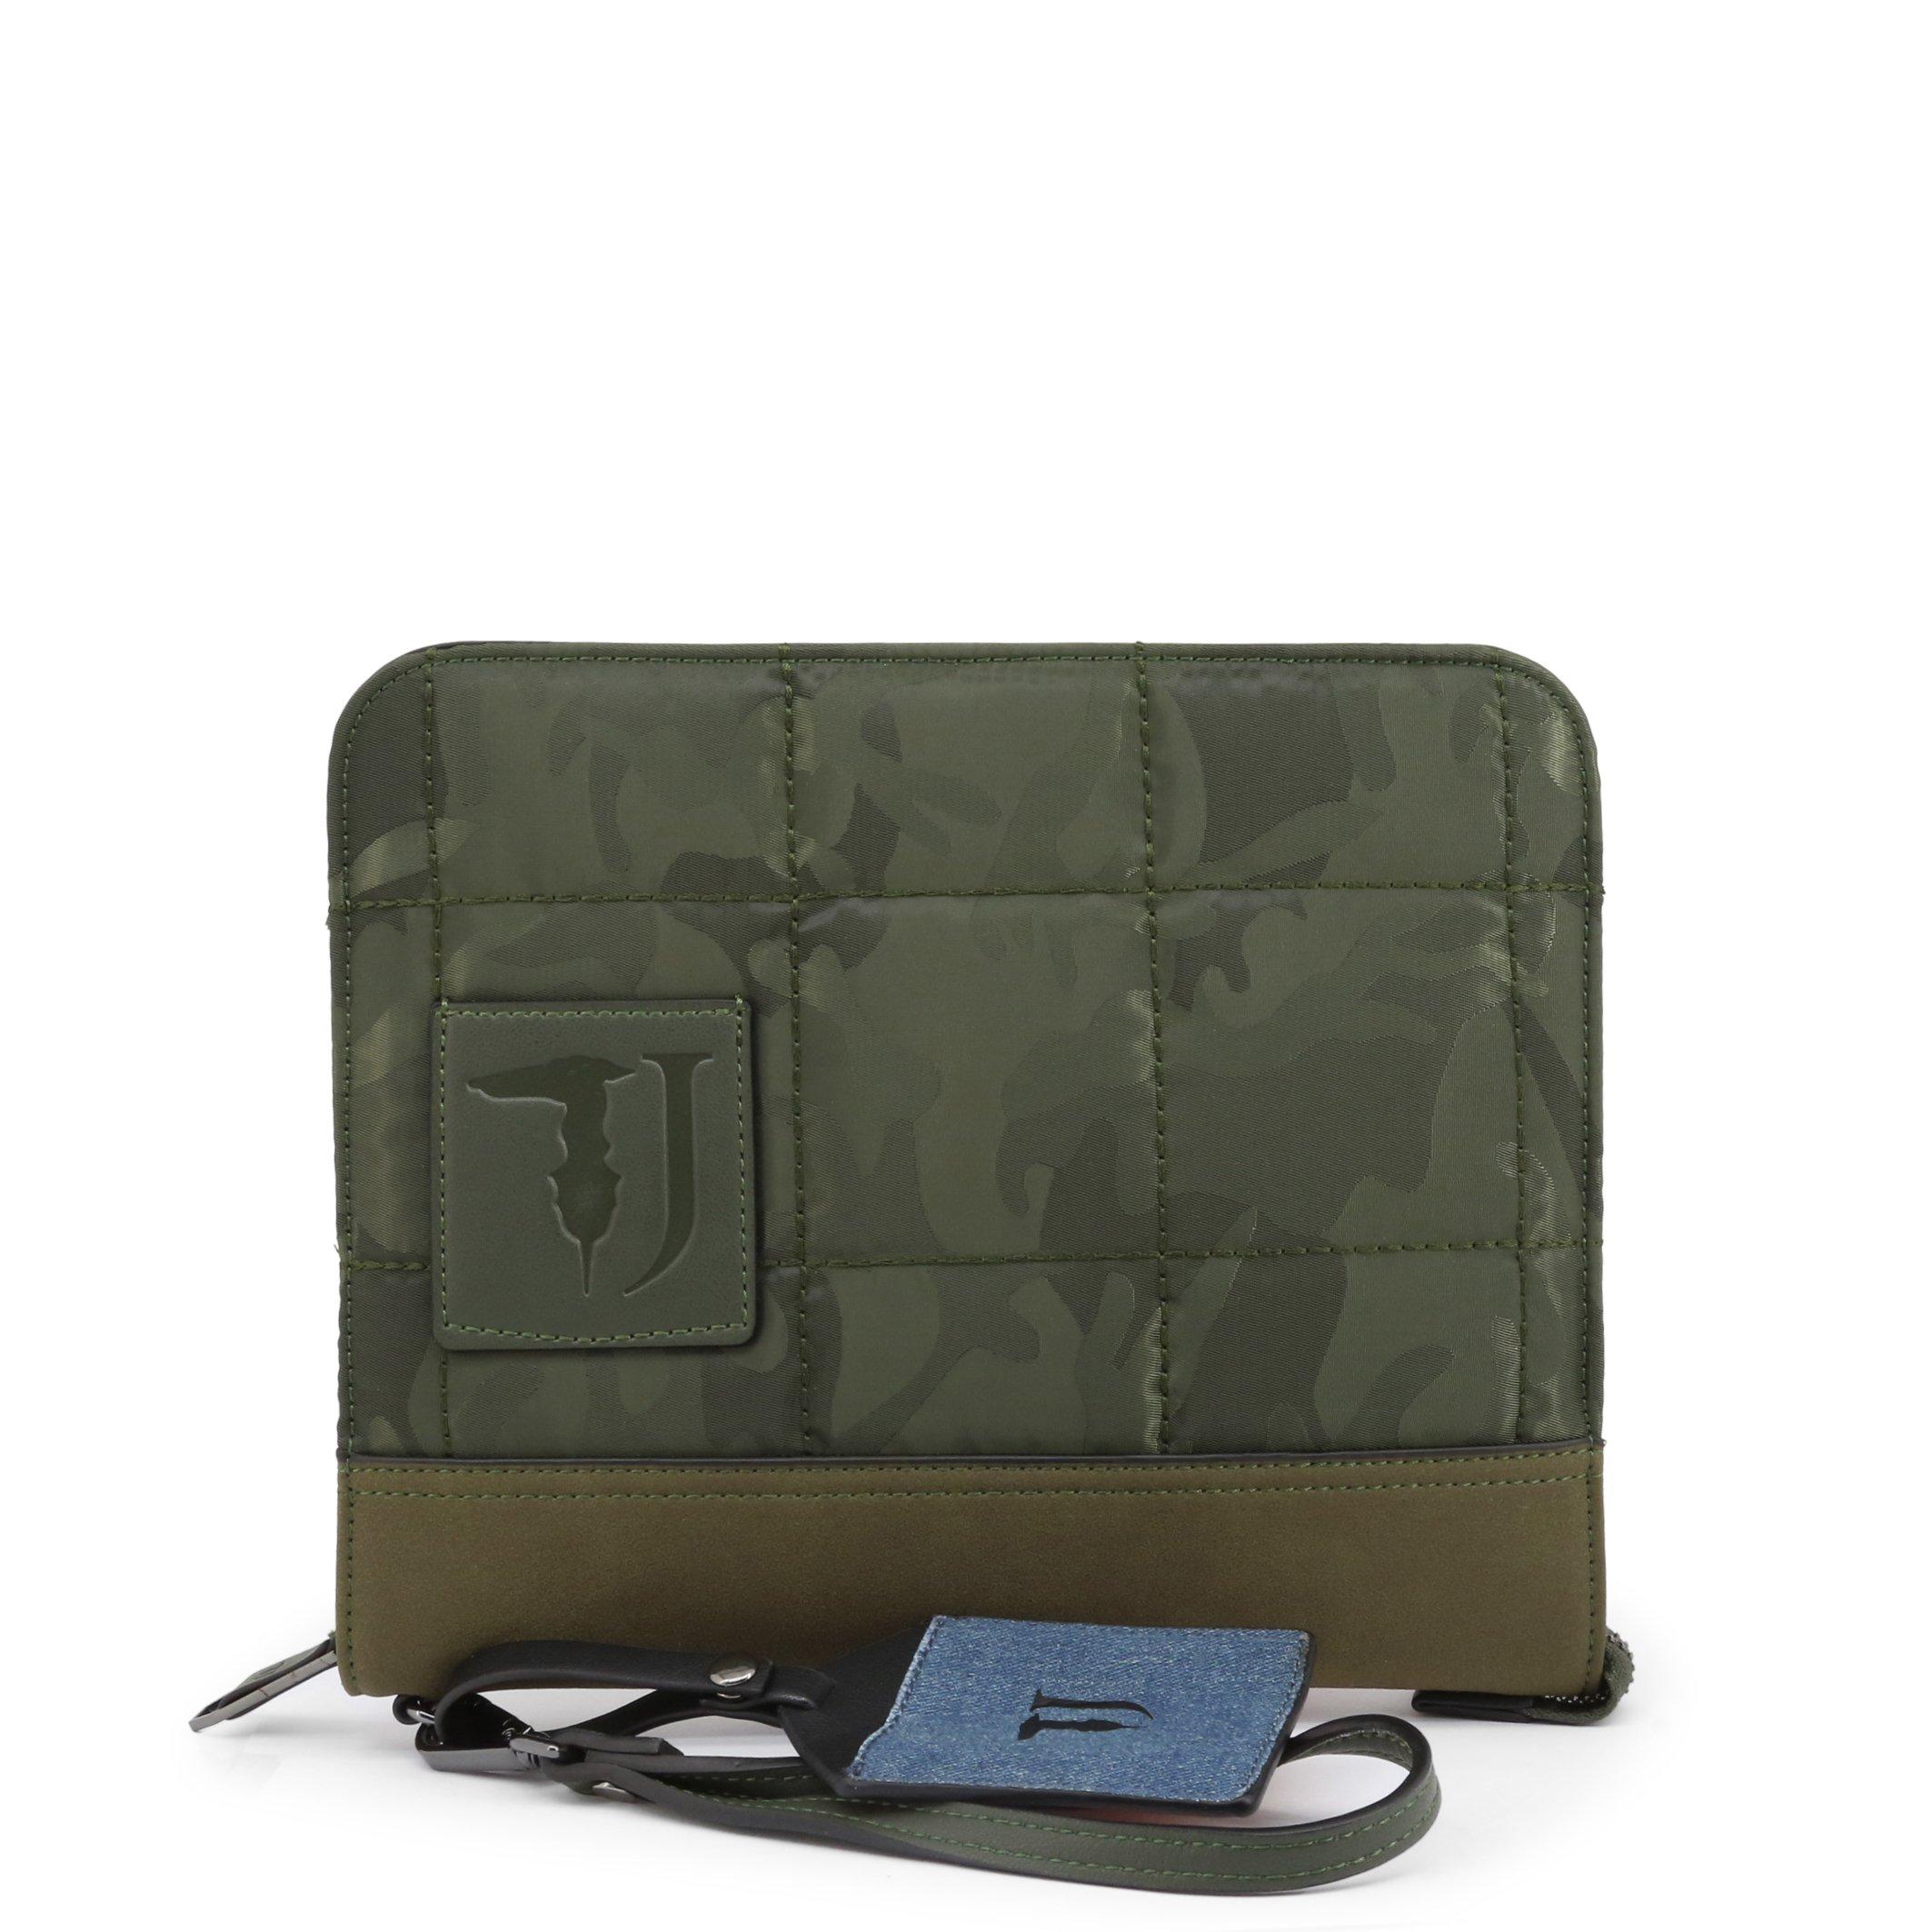 Trussardi Women's Handbag Various Colours TICINESE_71B00105-98 - green NOSIZE